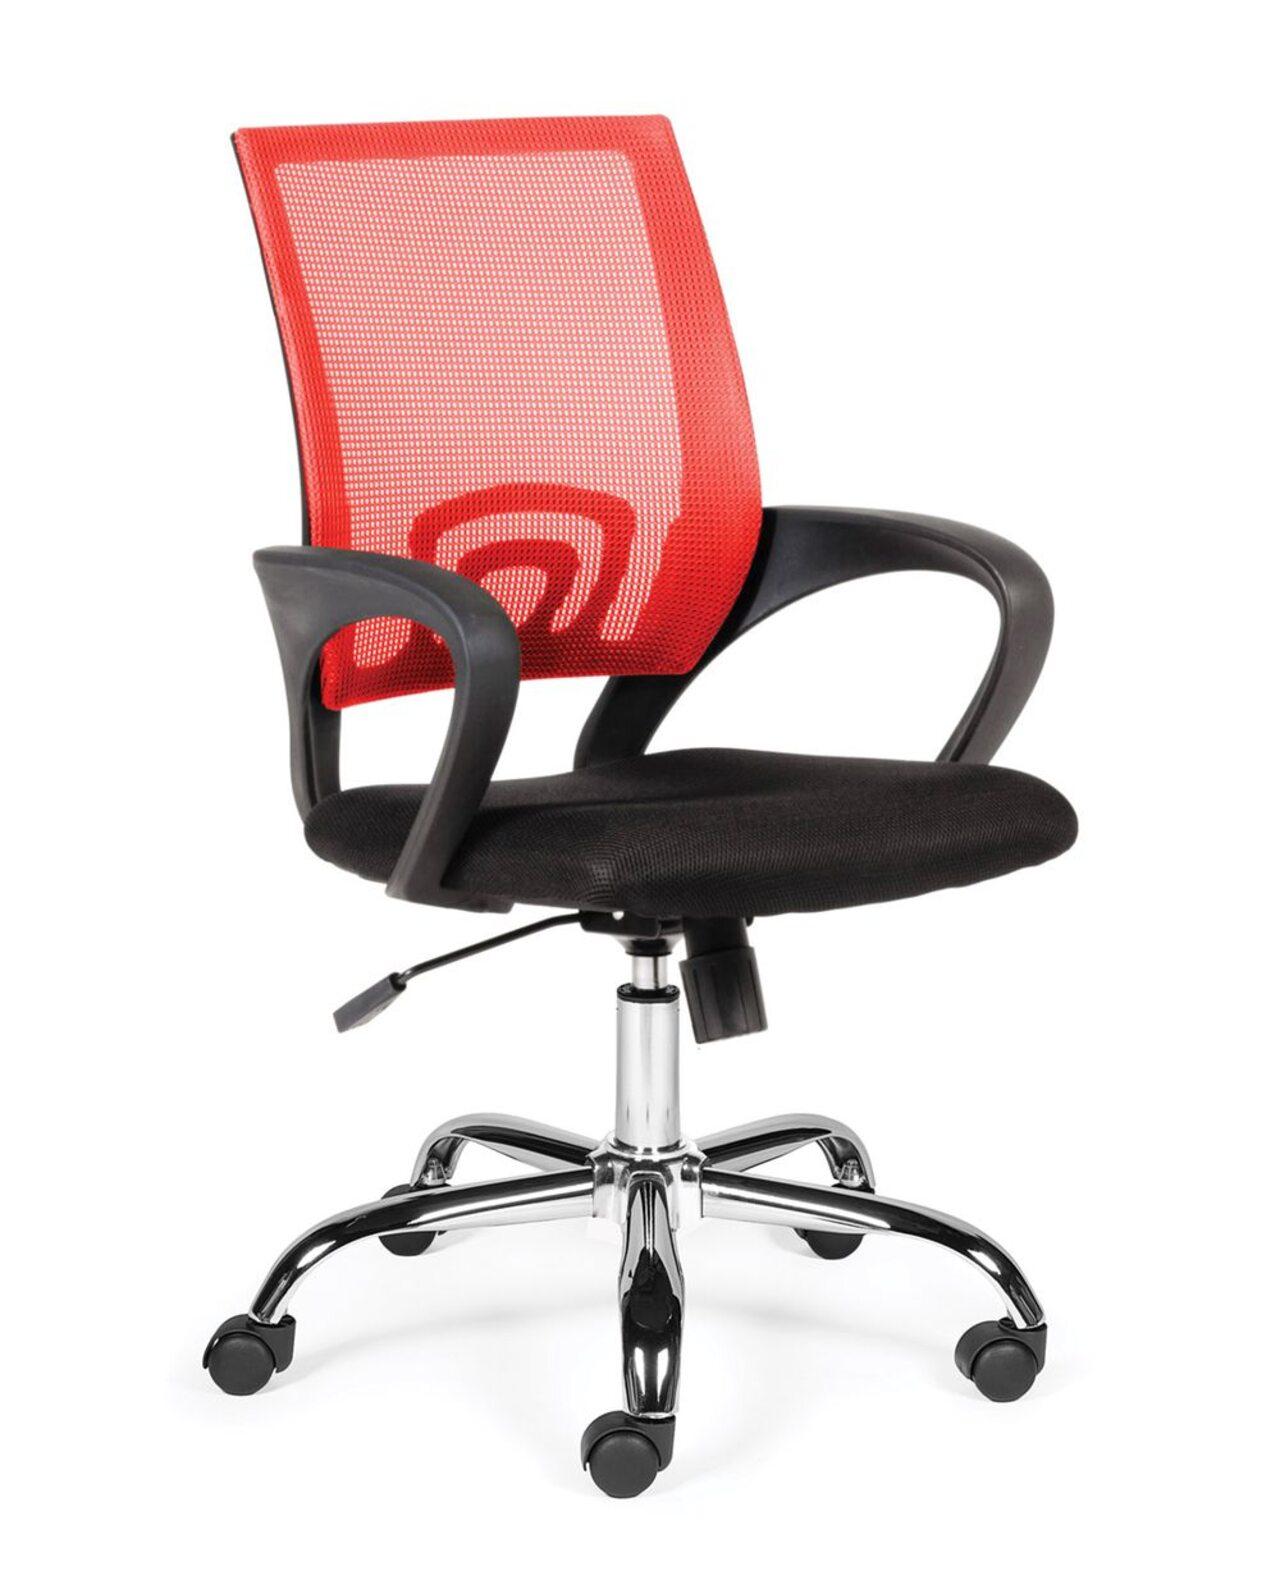 Кресло офисное Спринг 804-1 chrome  - фото 4